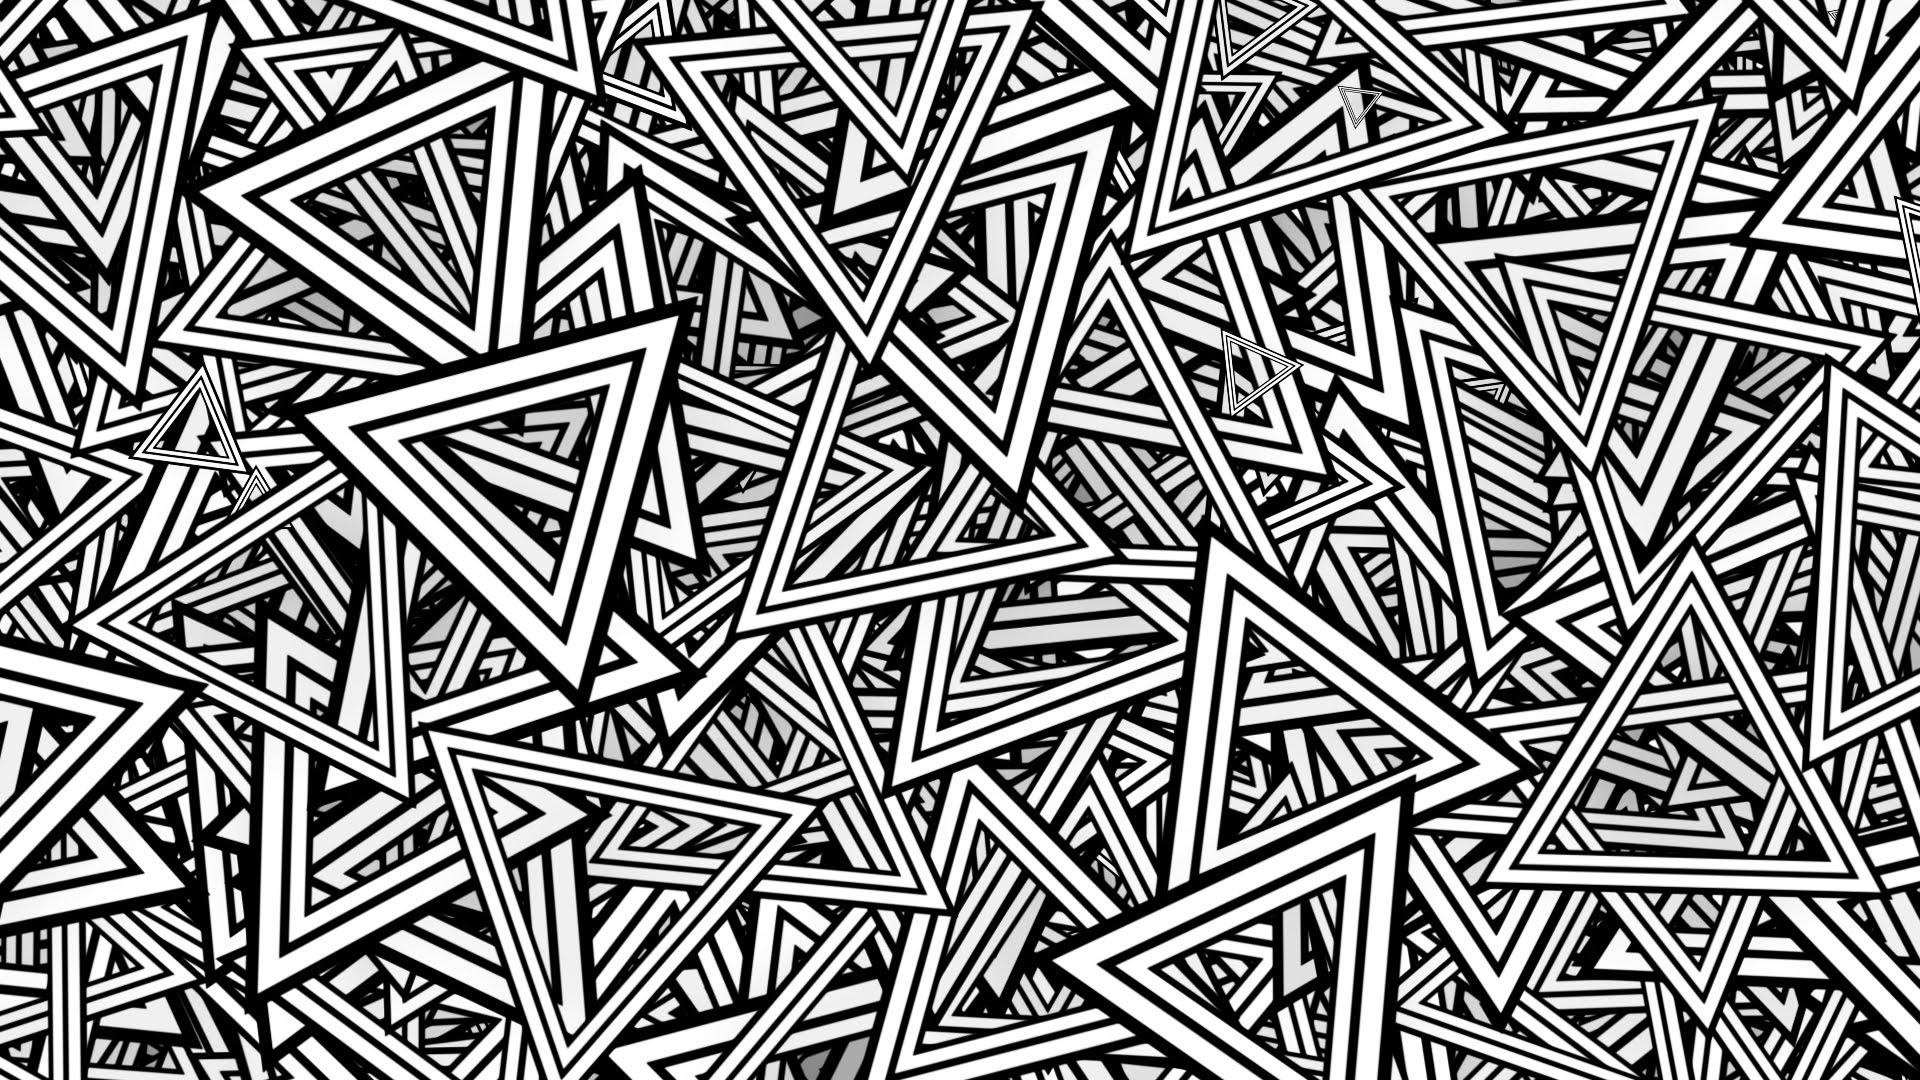 American Graffiti Cars Wallpaper Art Deco Backgrounds Desktop Wallpapers Pixelstalk Net